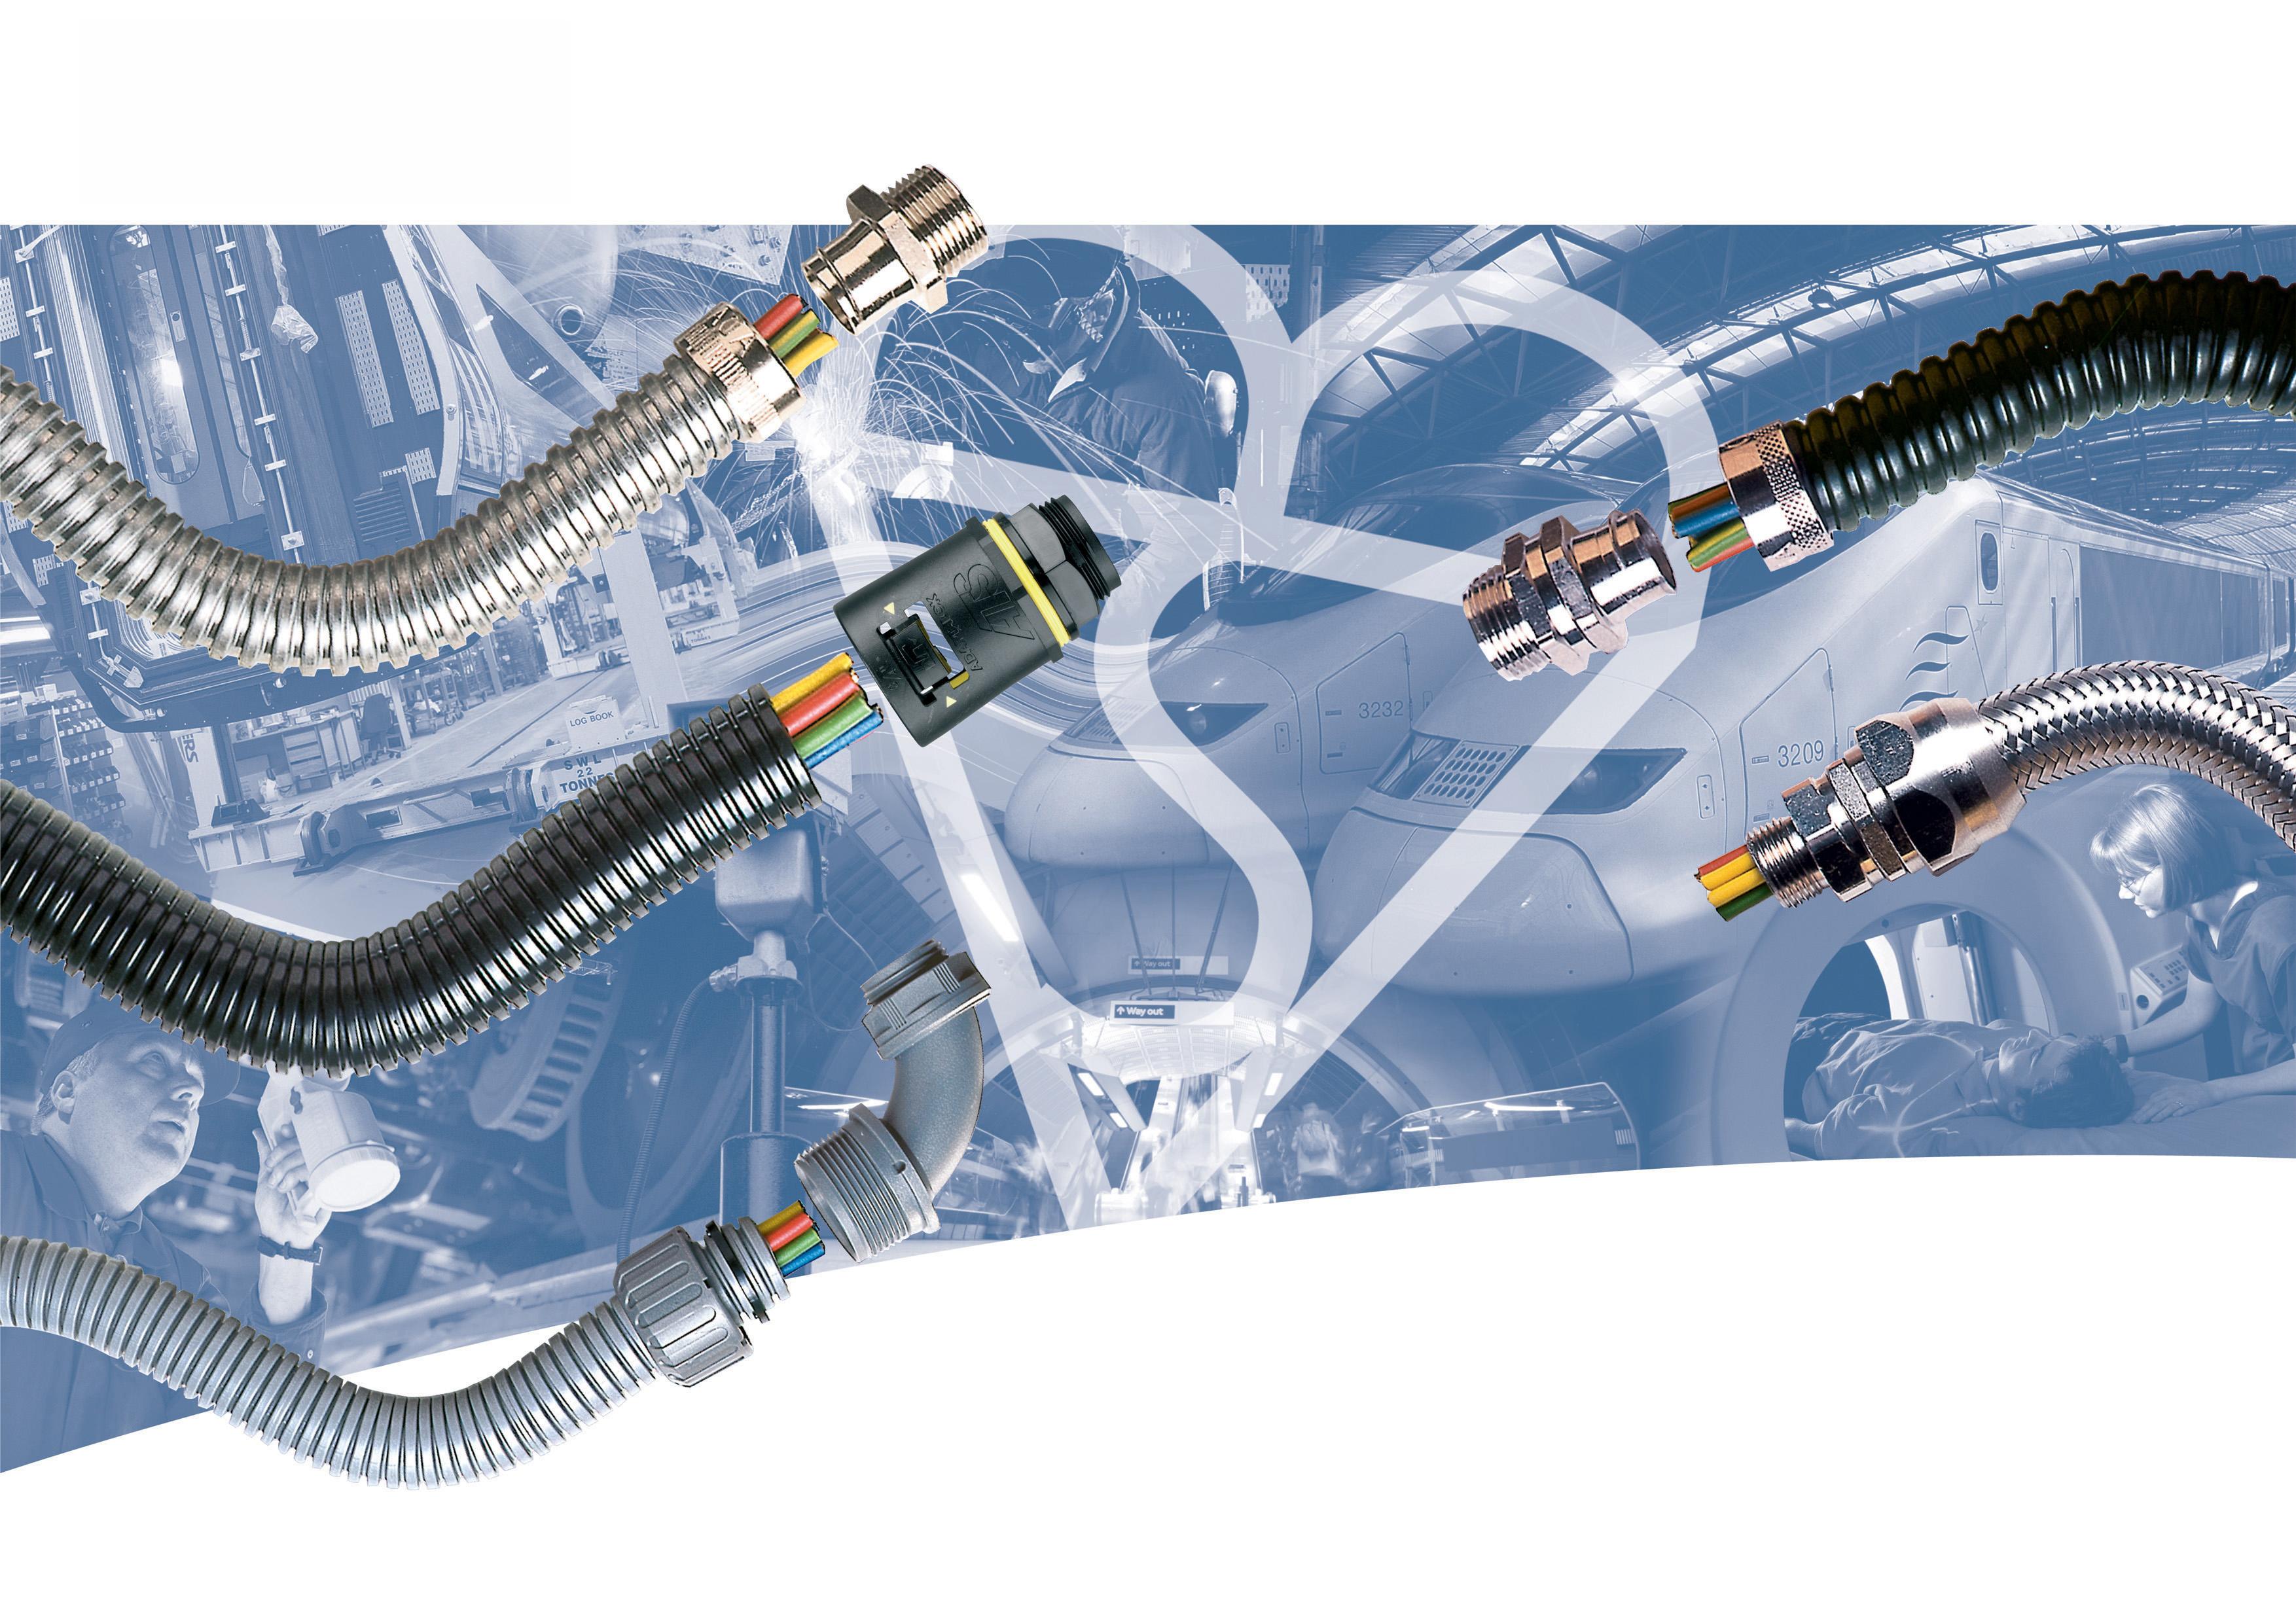 Flexible Conduit Systems